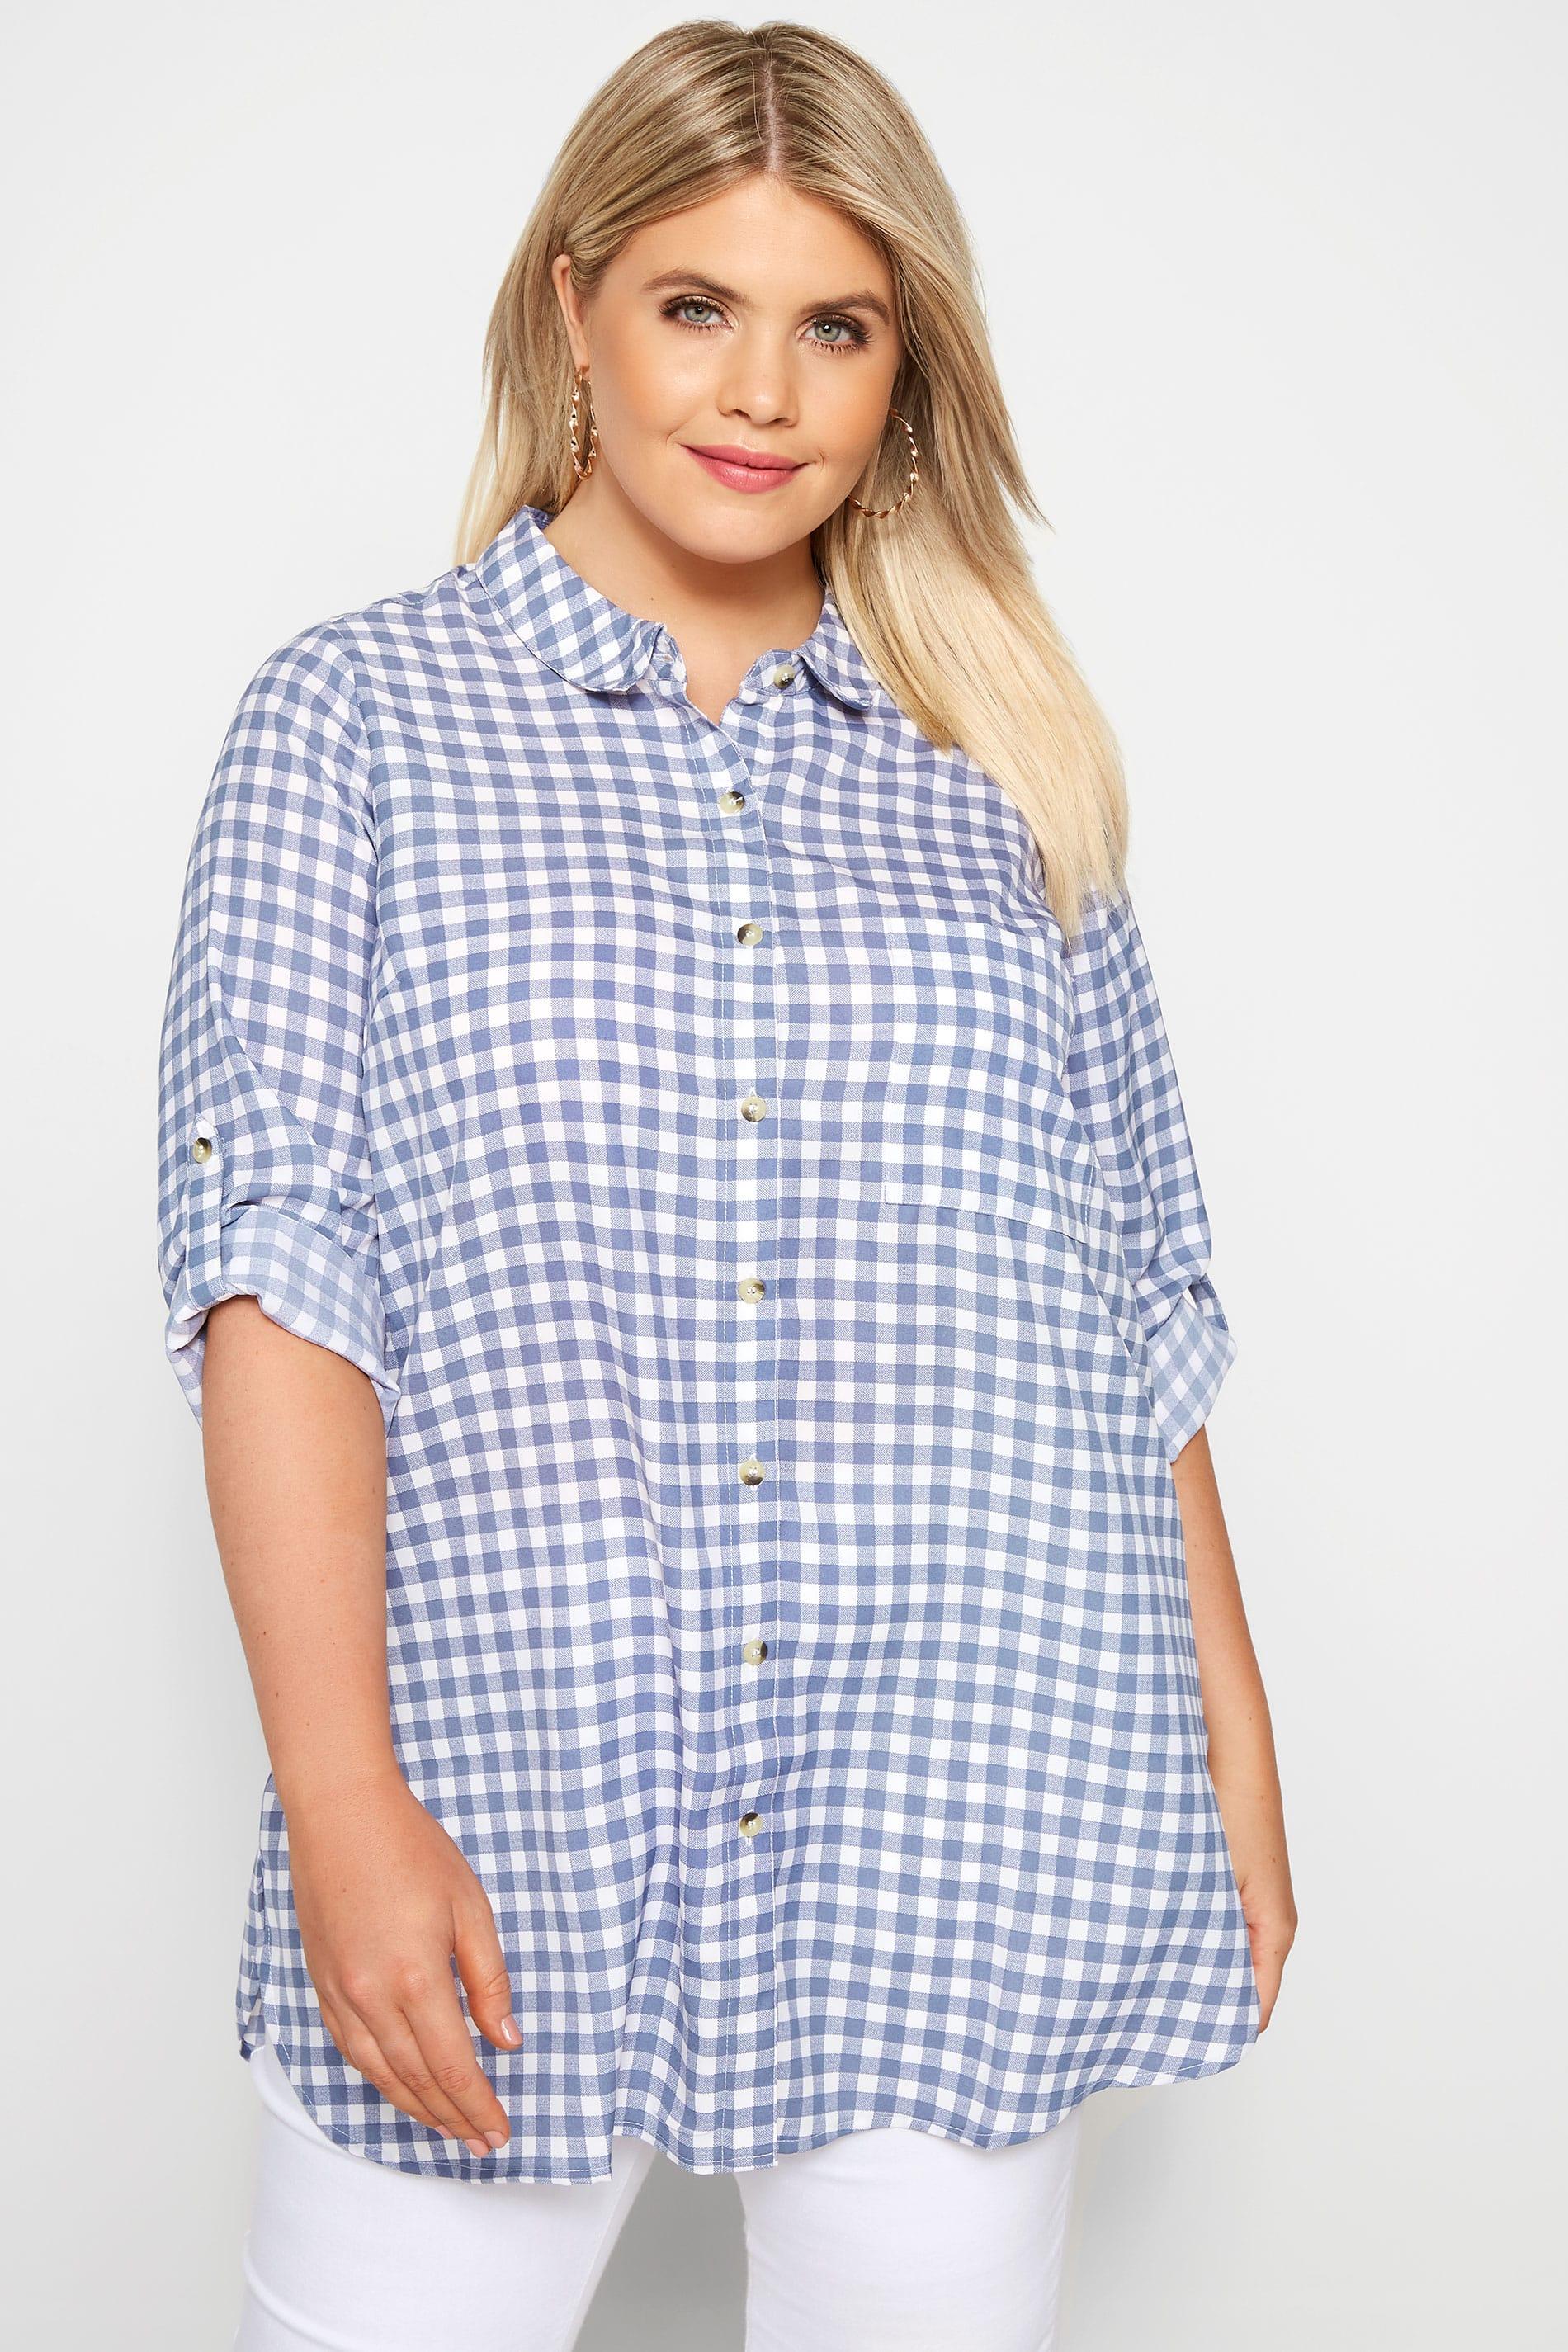 Blue Gingham Boyfriend Shirt